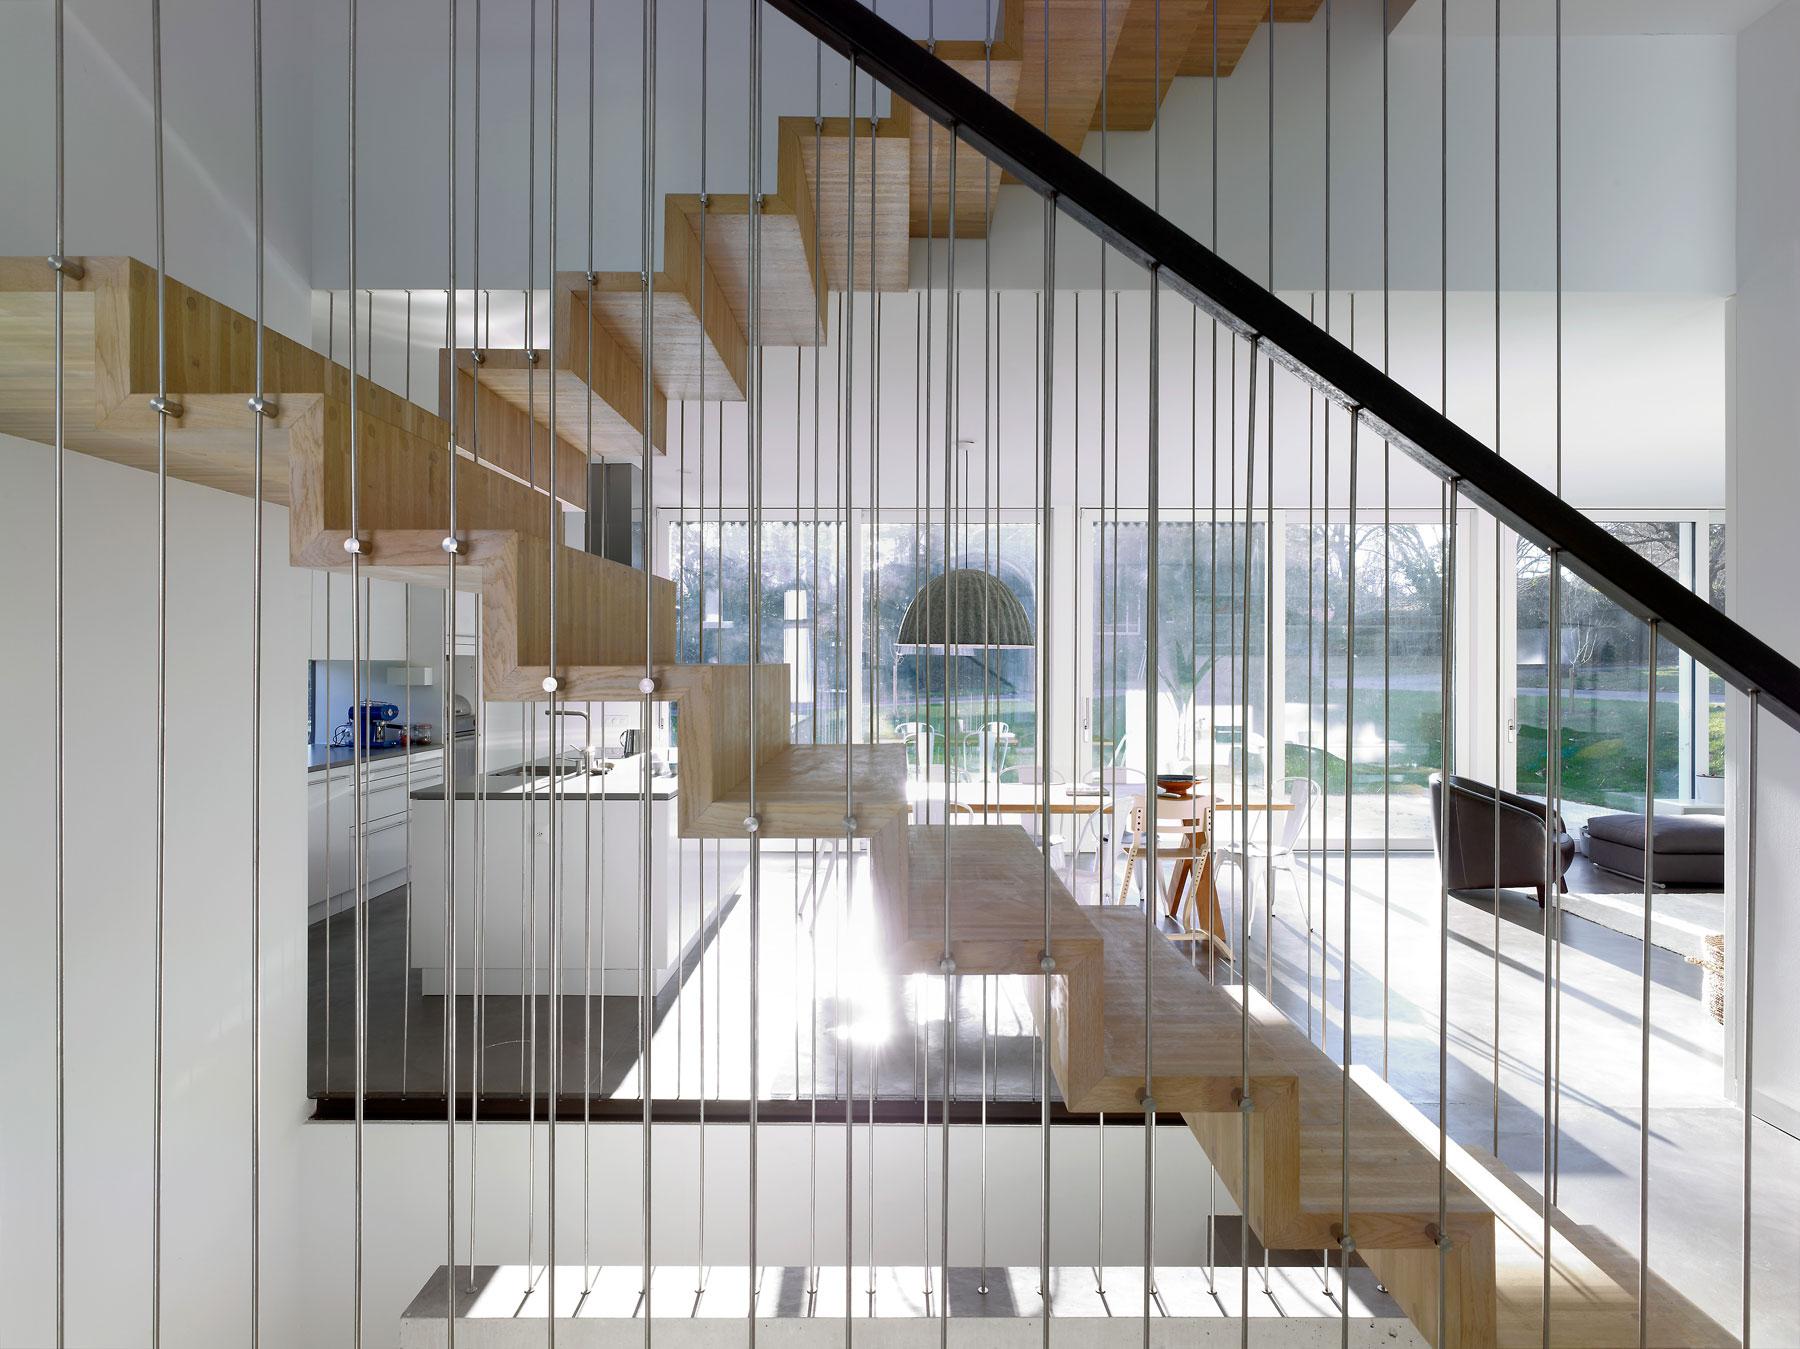 Minergie Villa Christian von Düring architecte-13